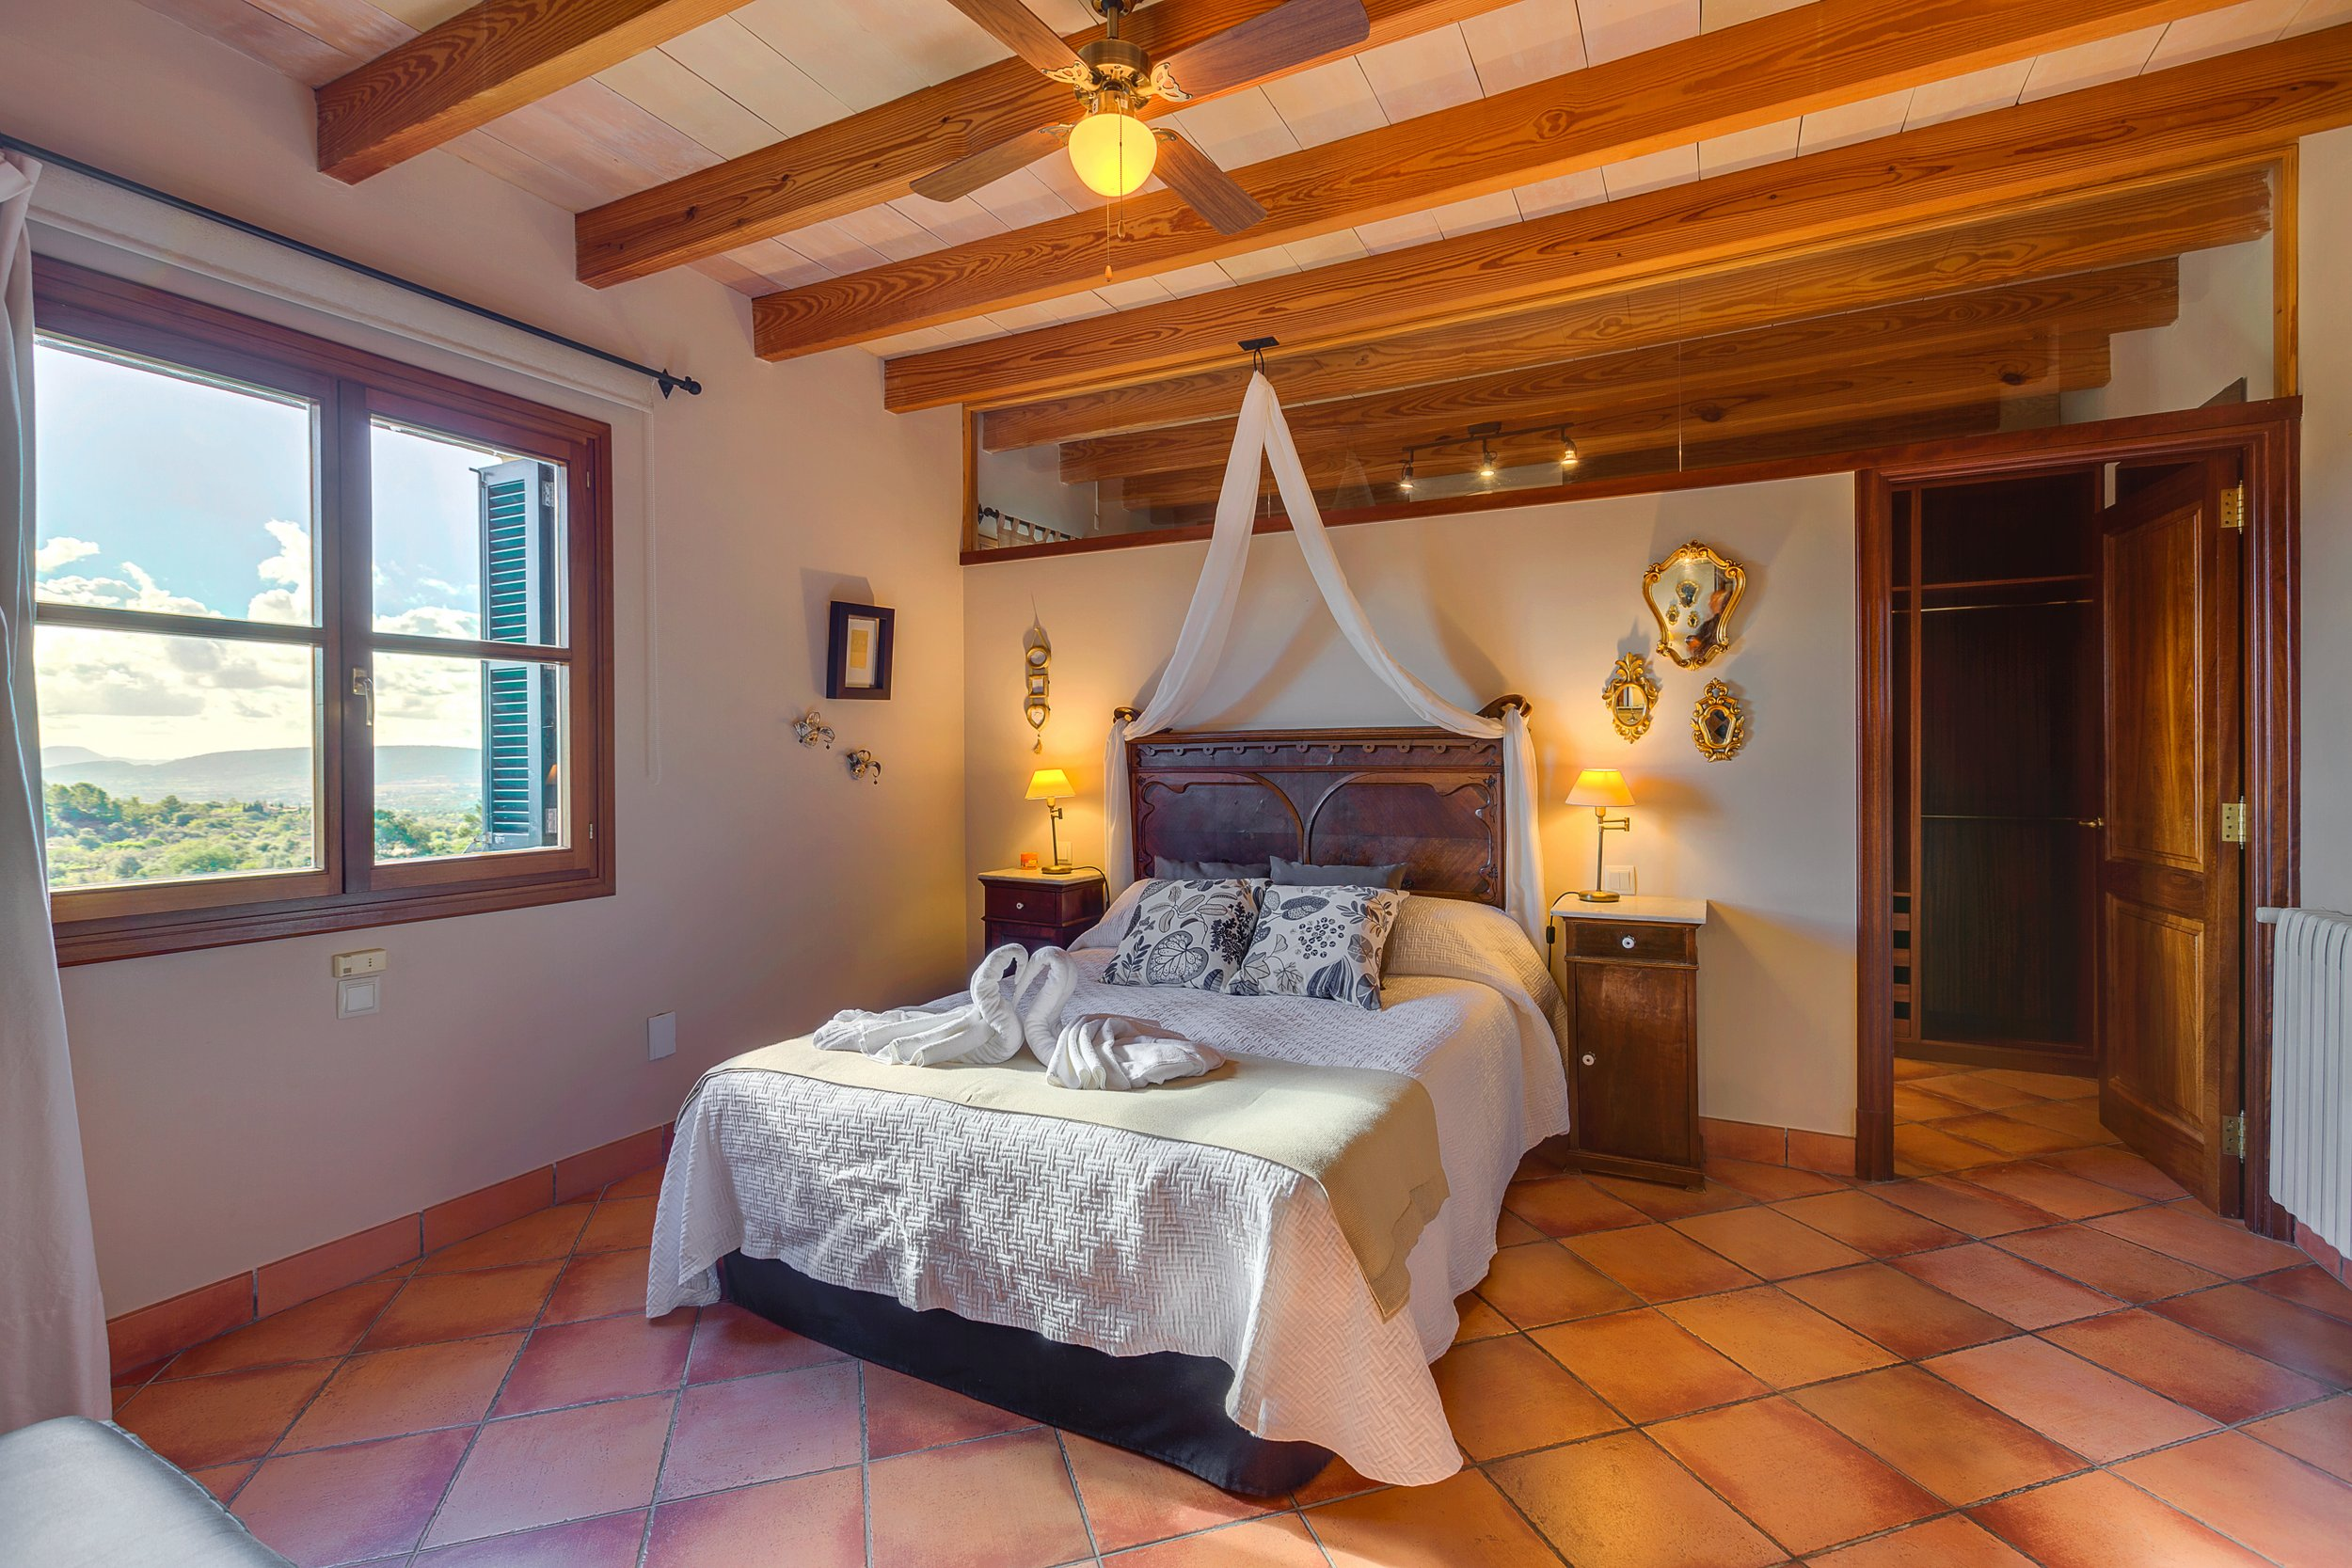 Maison de vacances Villa Cirera in Alaro (2611793), Alaro, Majorque, Iles Baléares, Espagne, image 19